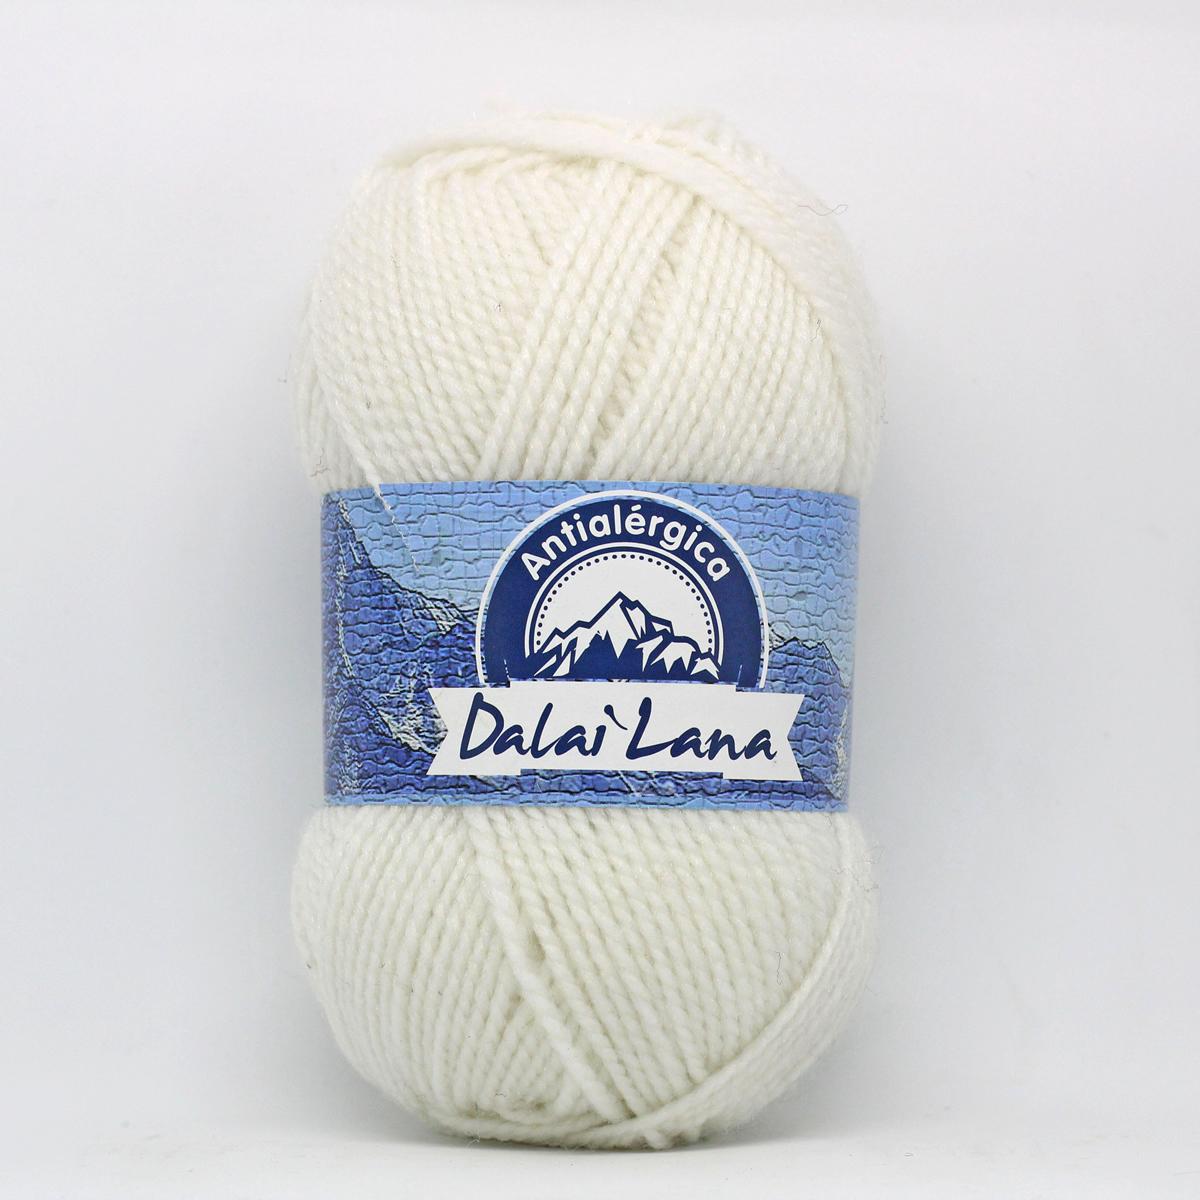 Dalai Lana - 750